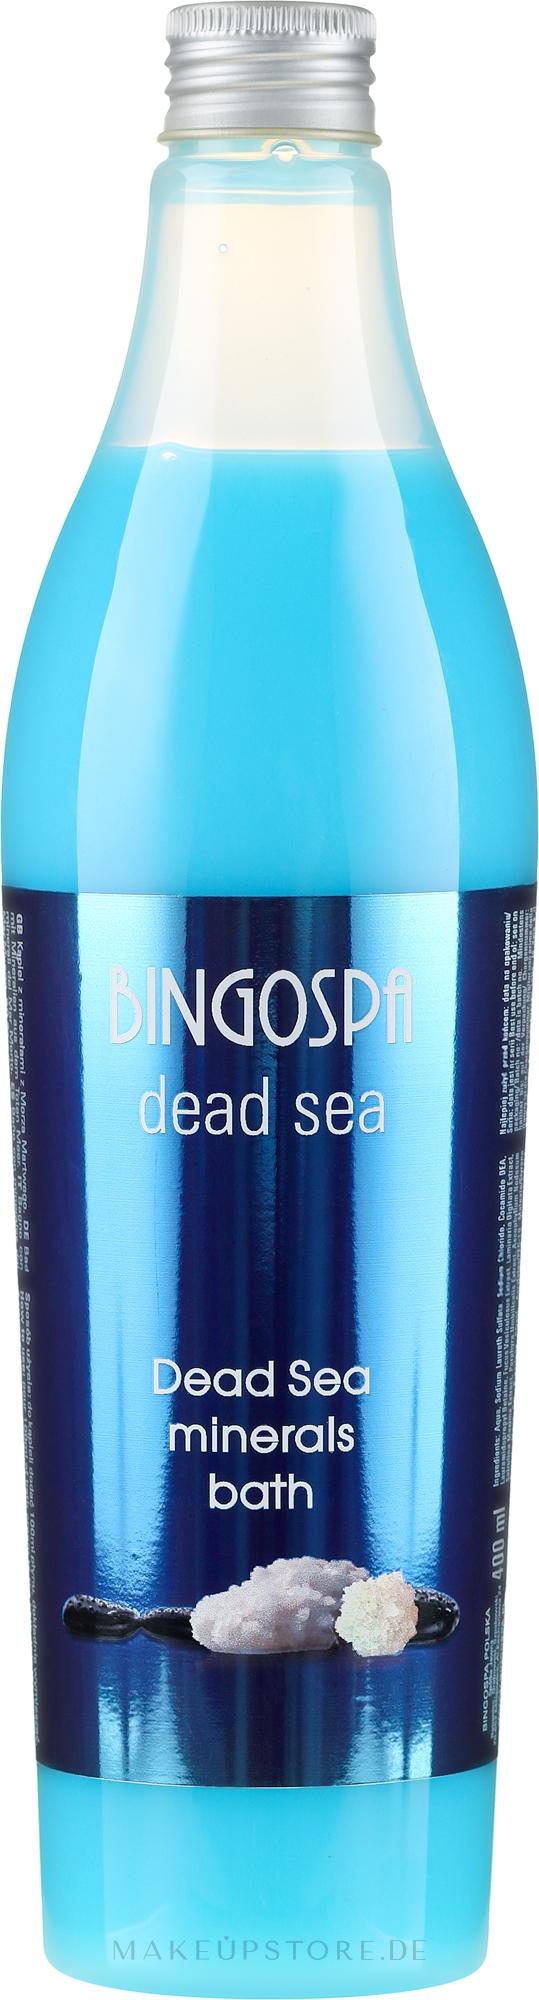 Badeschaum mit Mineralien aus dem Toten Meer - Bingo Spa Dead Sea Minerals Bath — Bild 400 ml